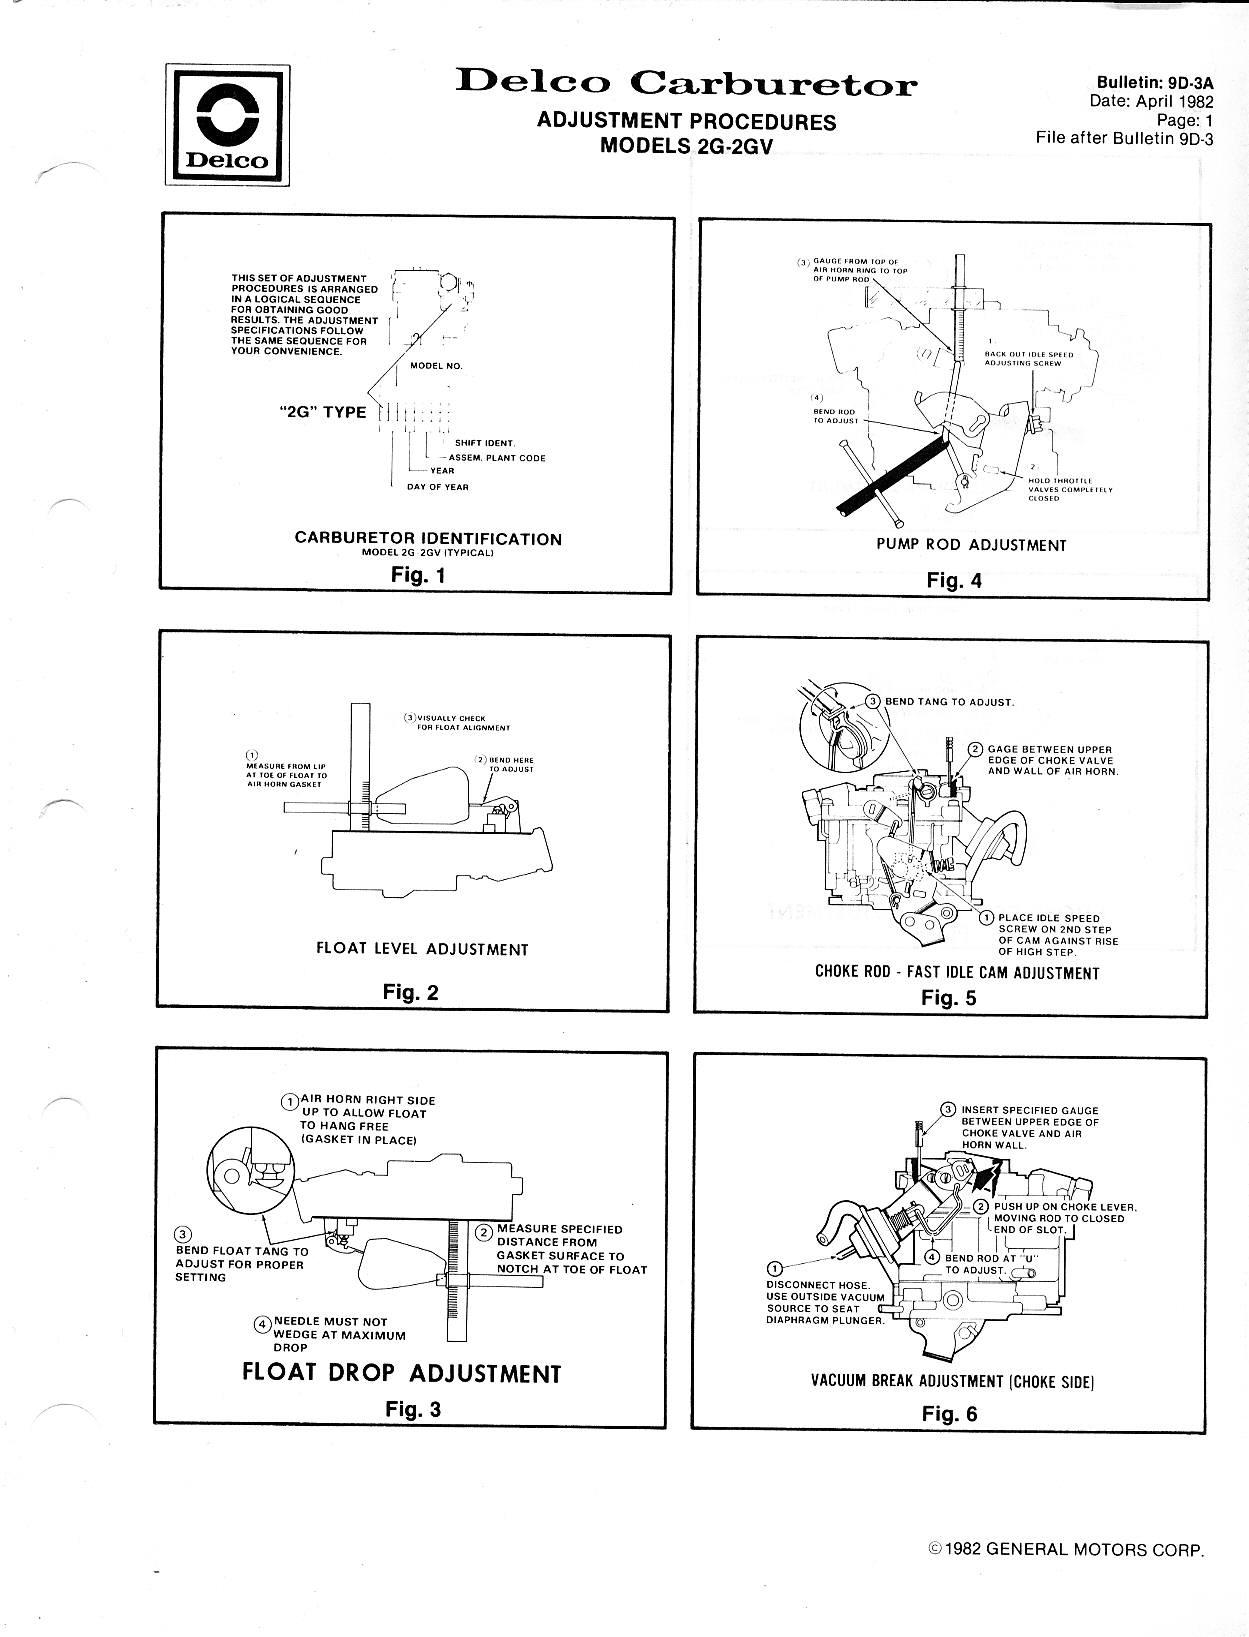 rochester 4 barrel carburetor diagram micro usb pinout 2 jet manual the old car project